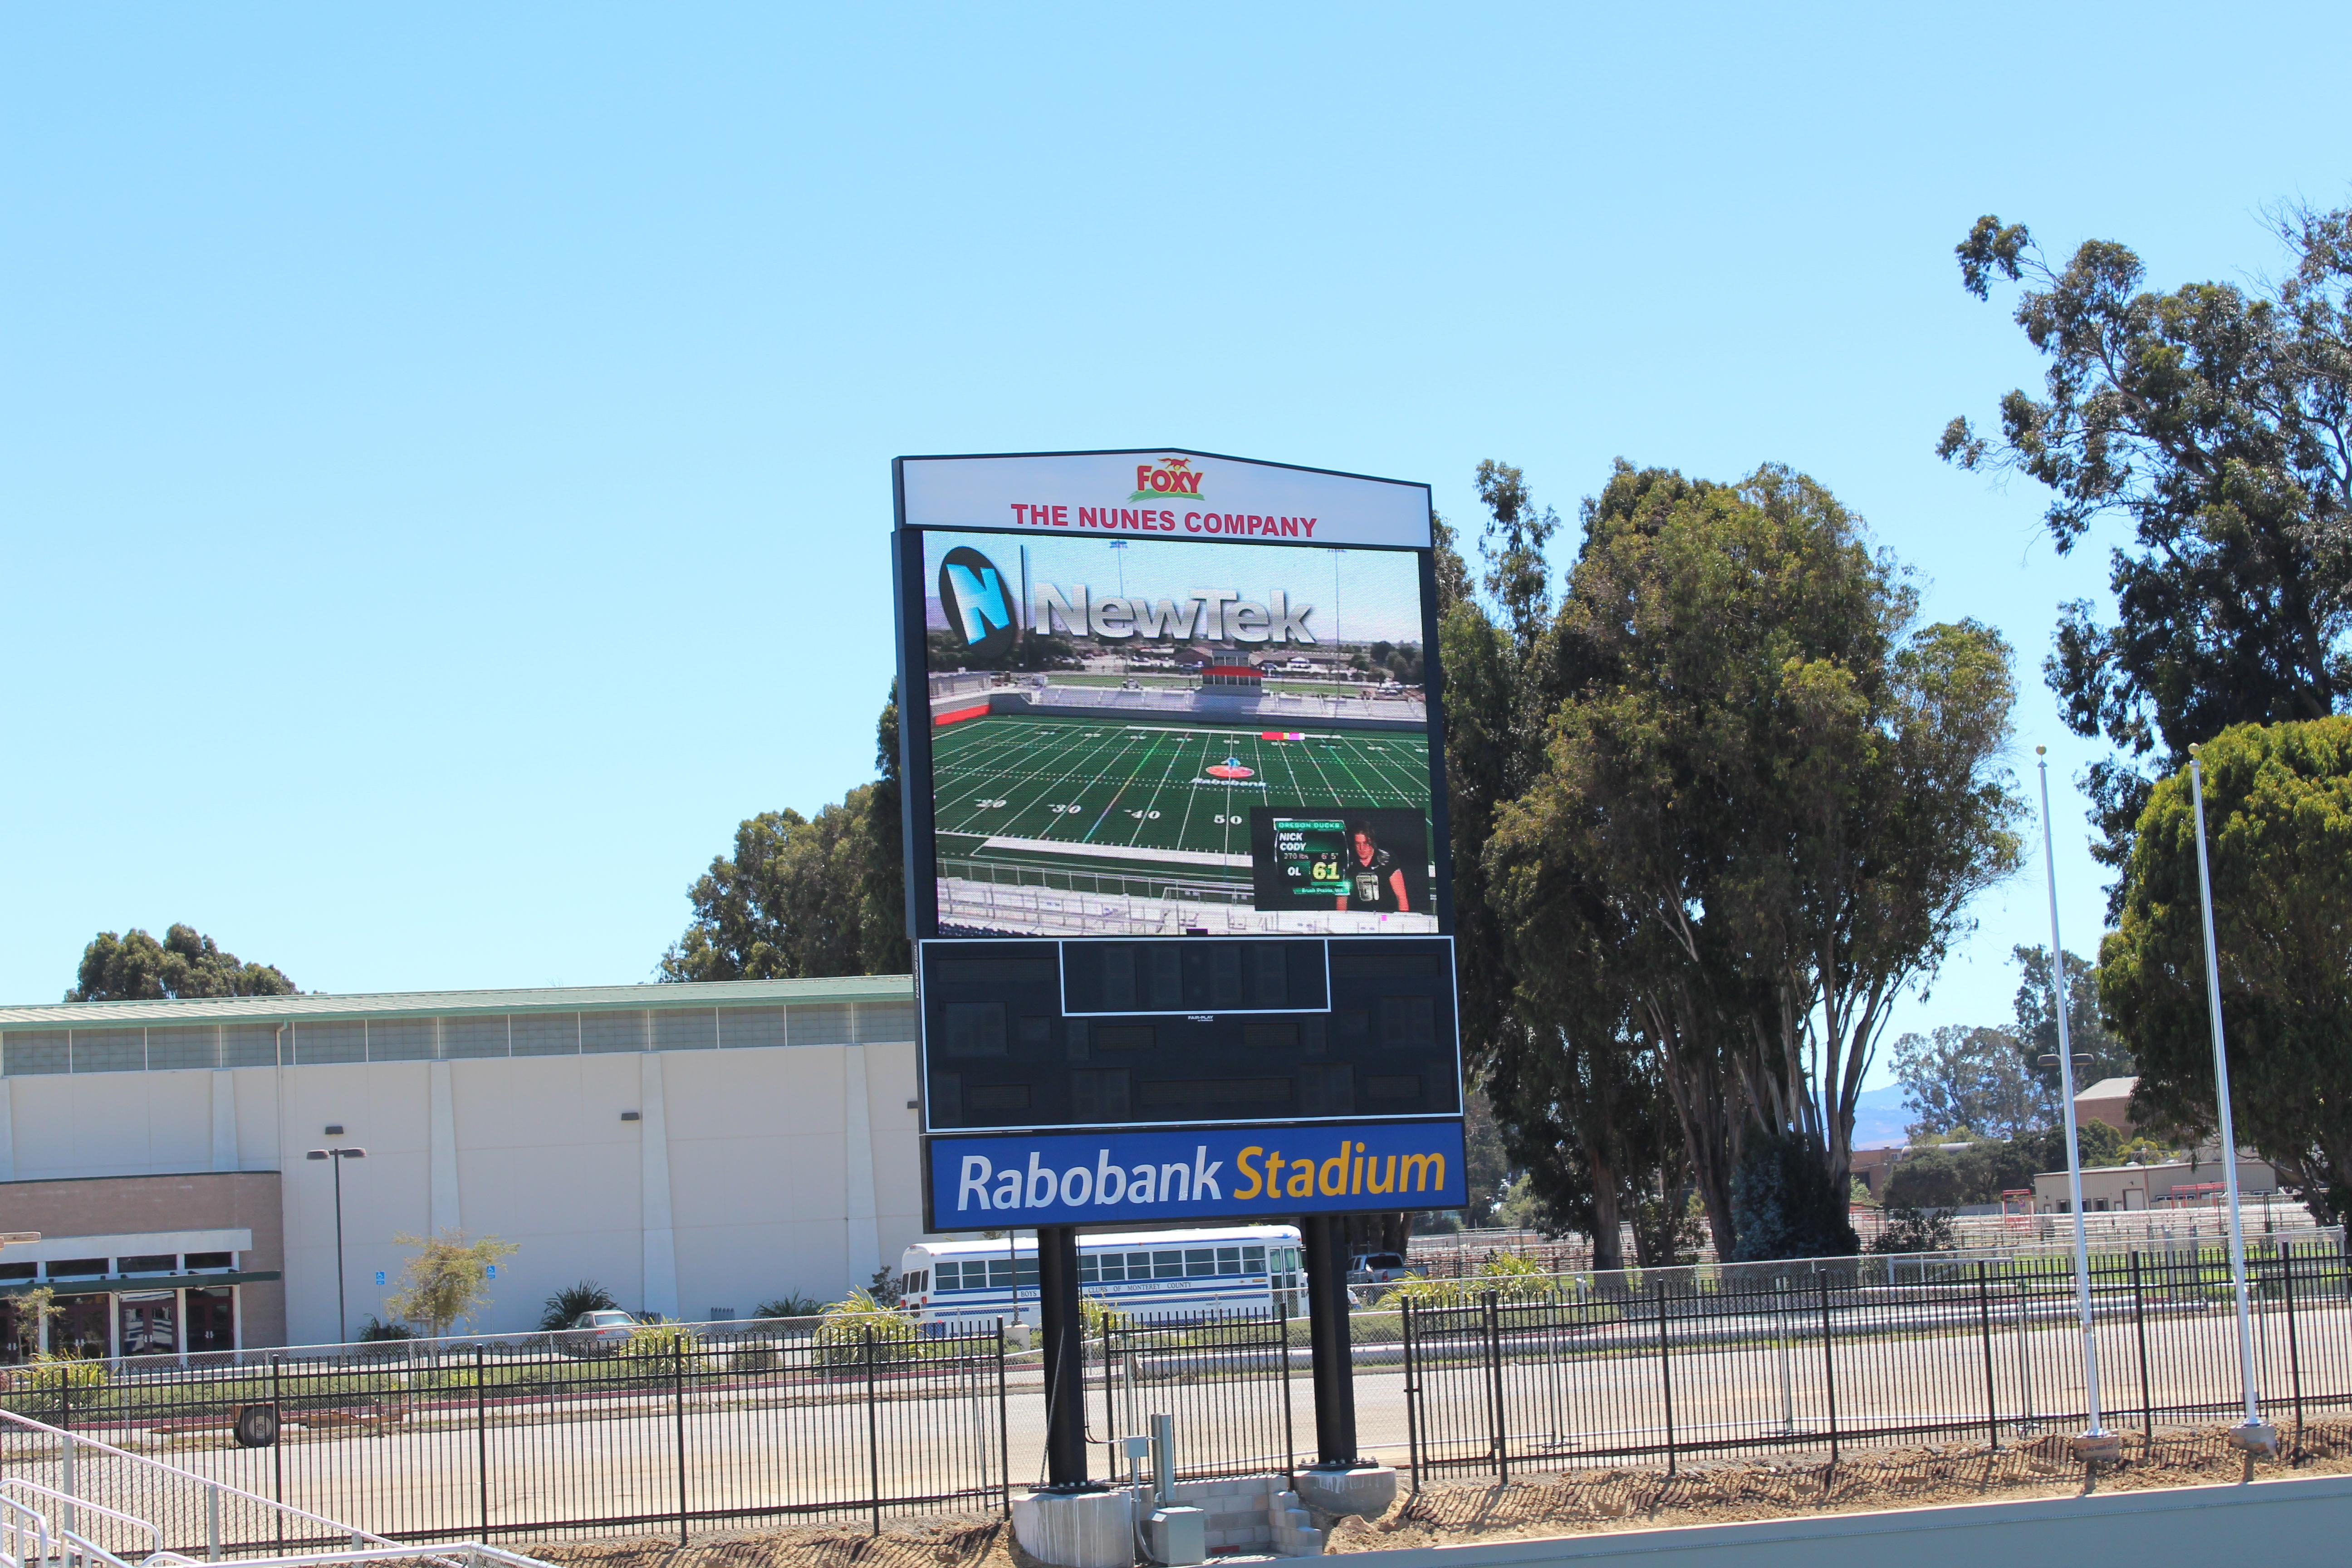 Rabobank Stadium Salinas – 2